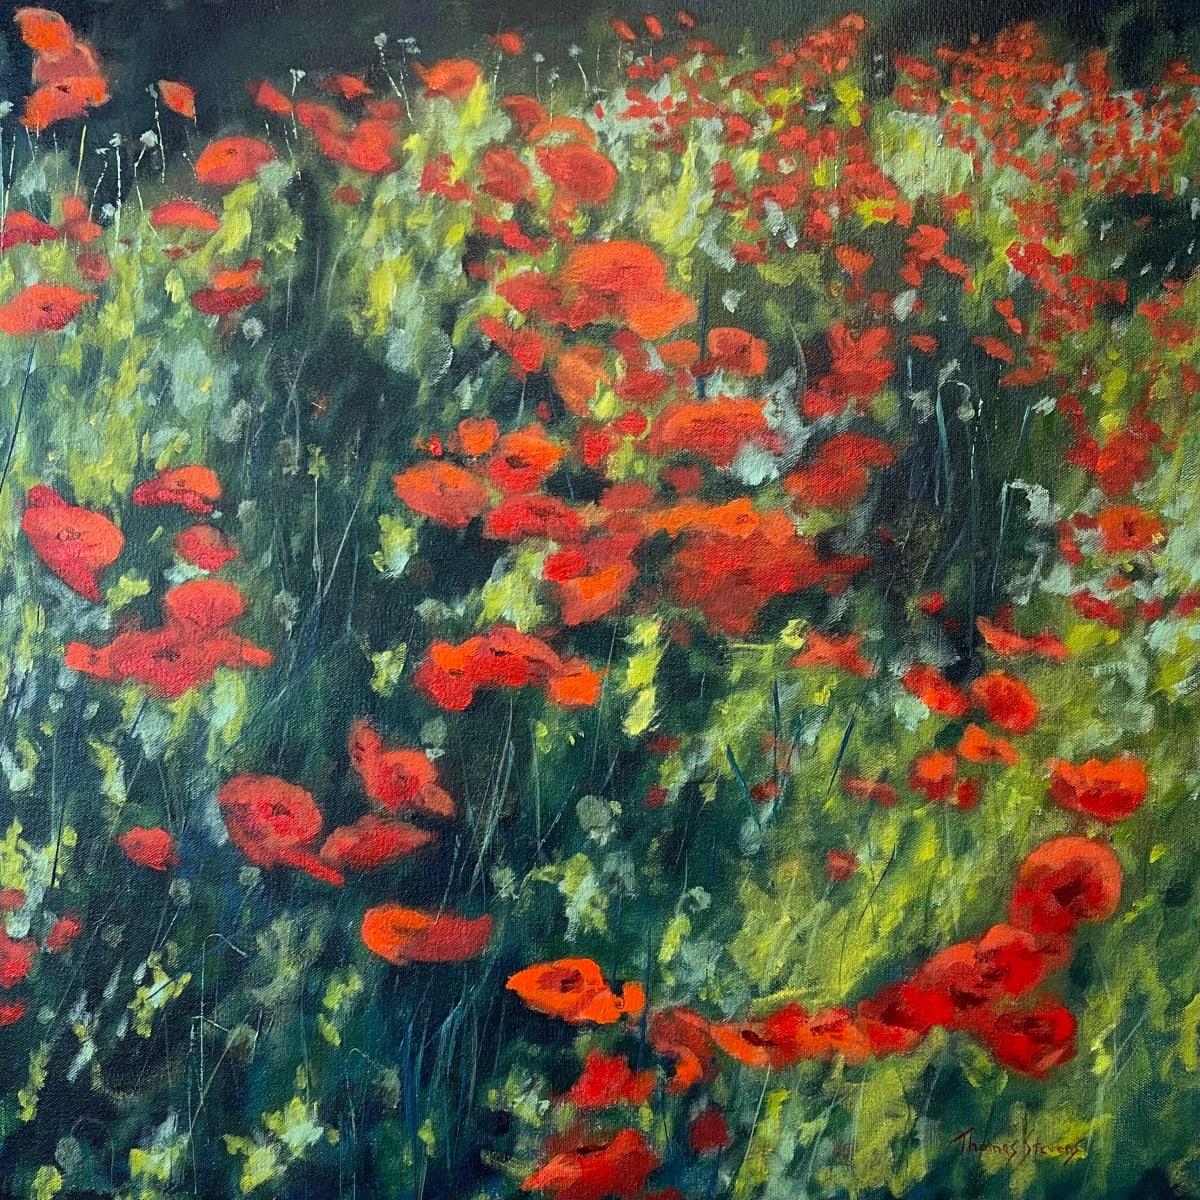 Poppies on King II  36.07546N 79.10113W by Thomas Stevens